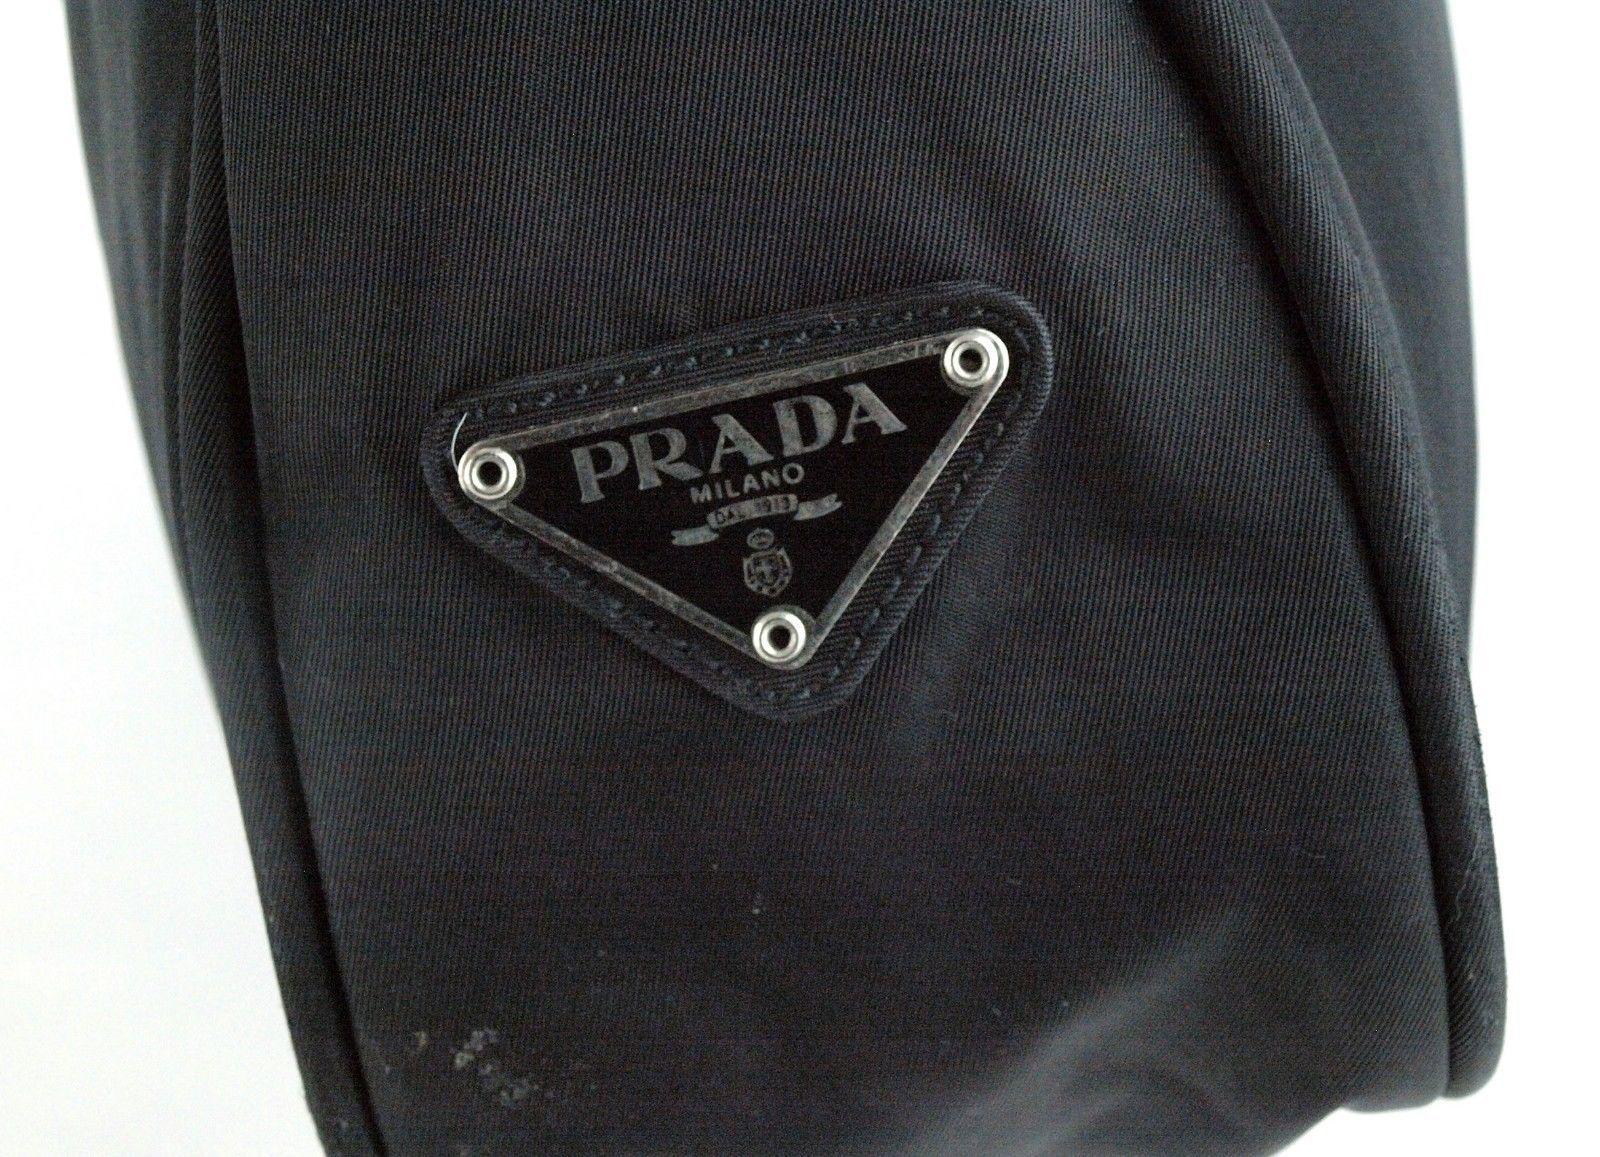 3f79b6af7d1f 100% Auth PRADA Milano Black Nylon Hobo Shoulder bag Pouch Bag Purse